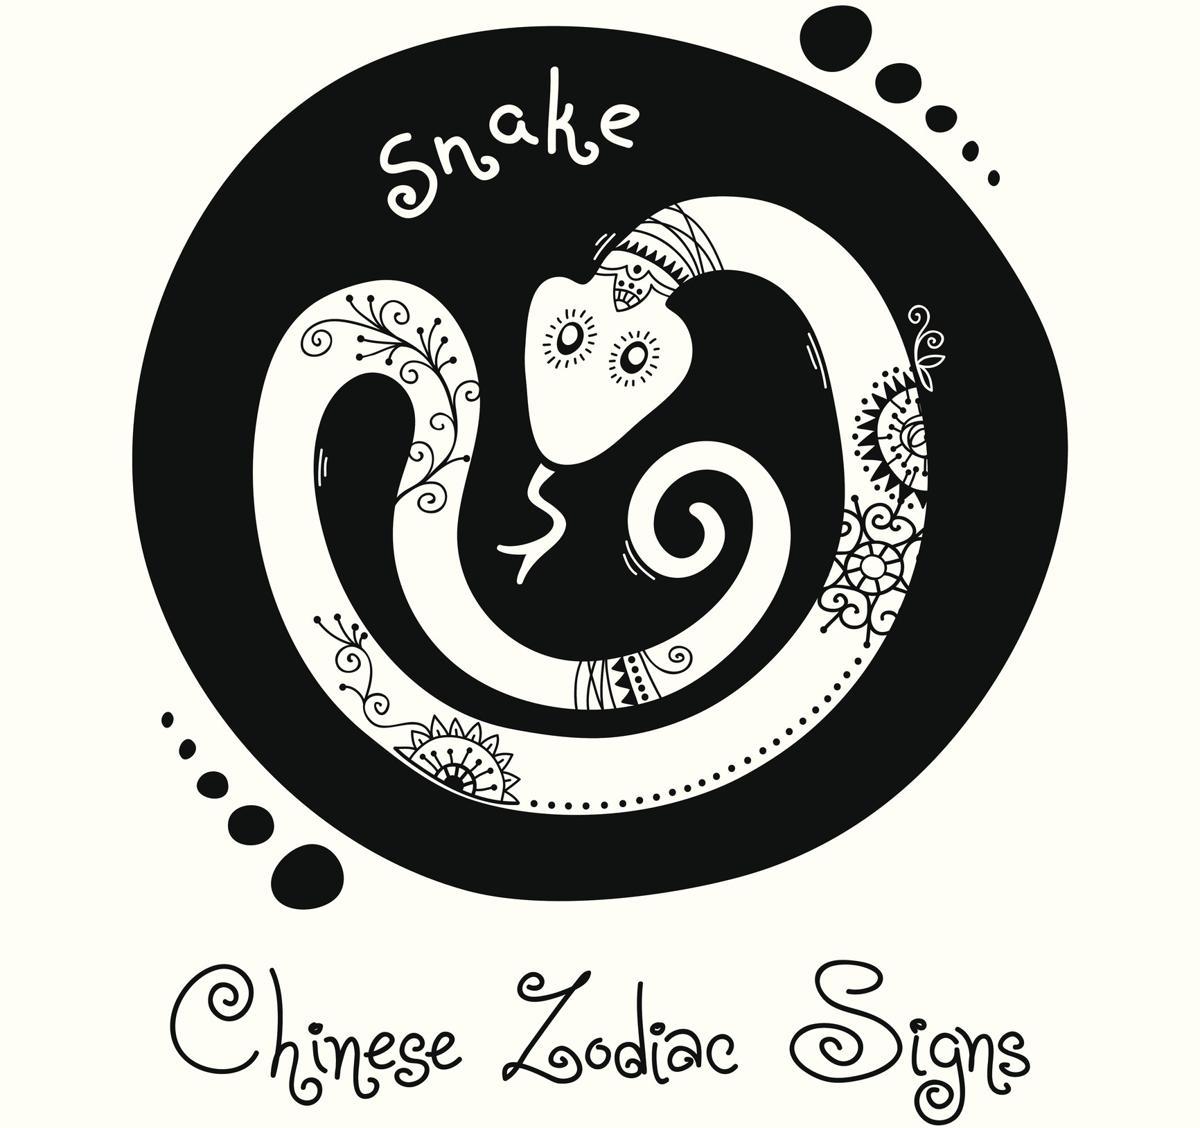 Chinese Zodiac Sign - Snake